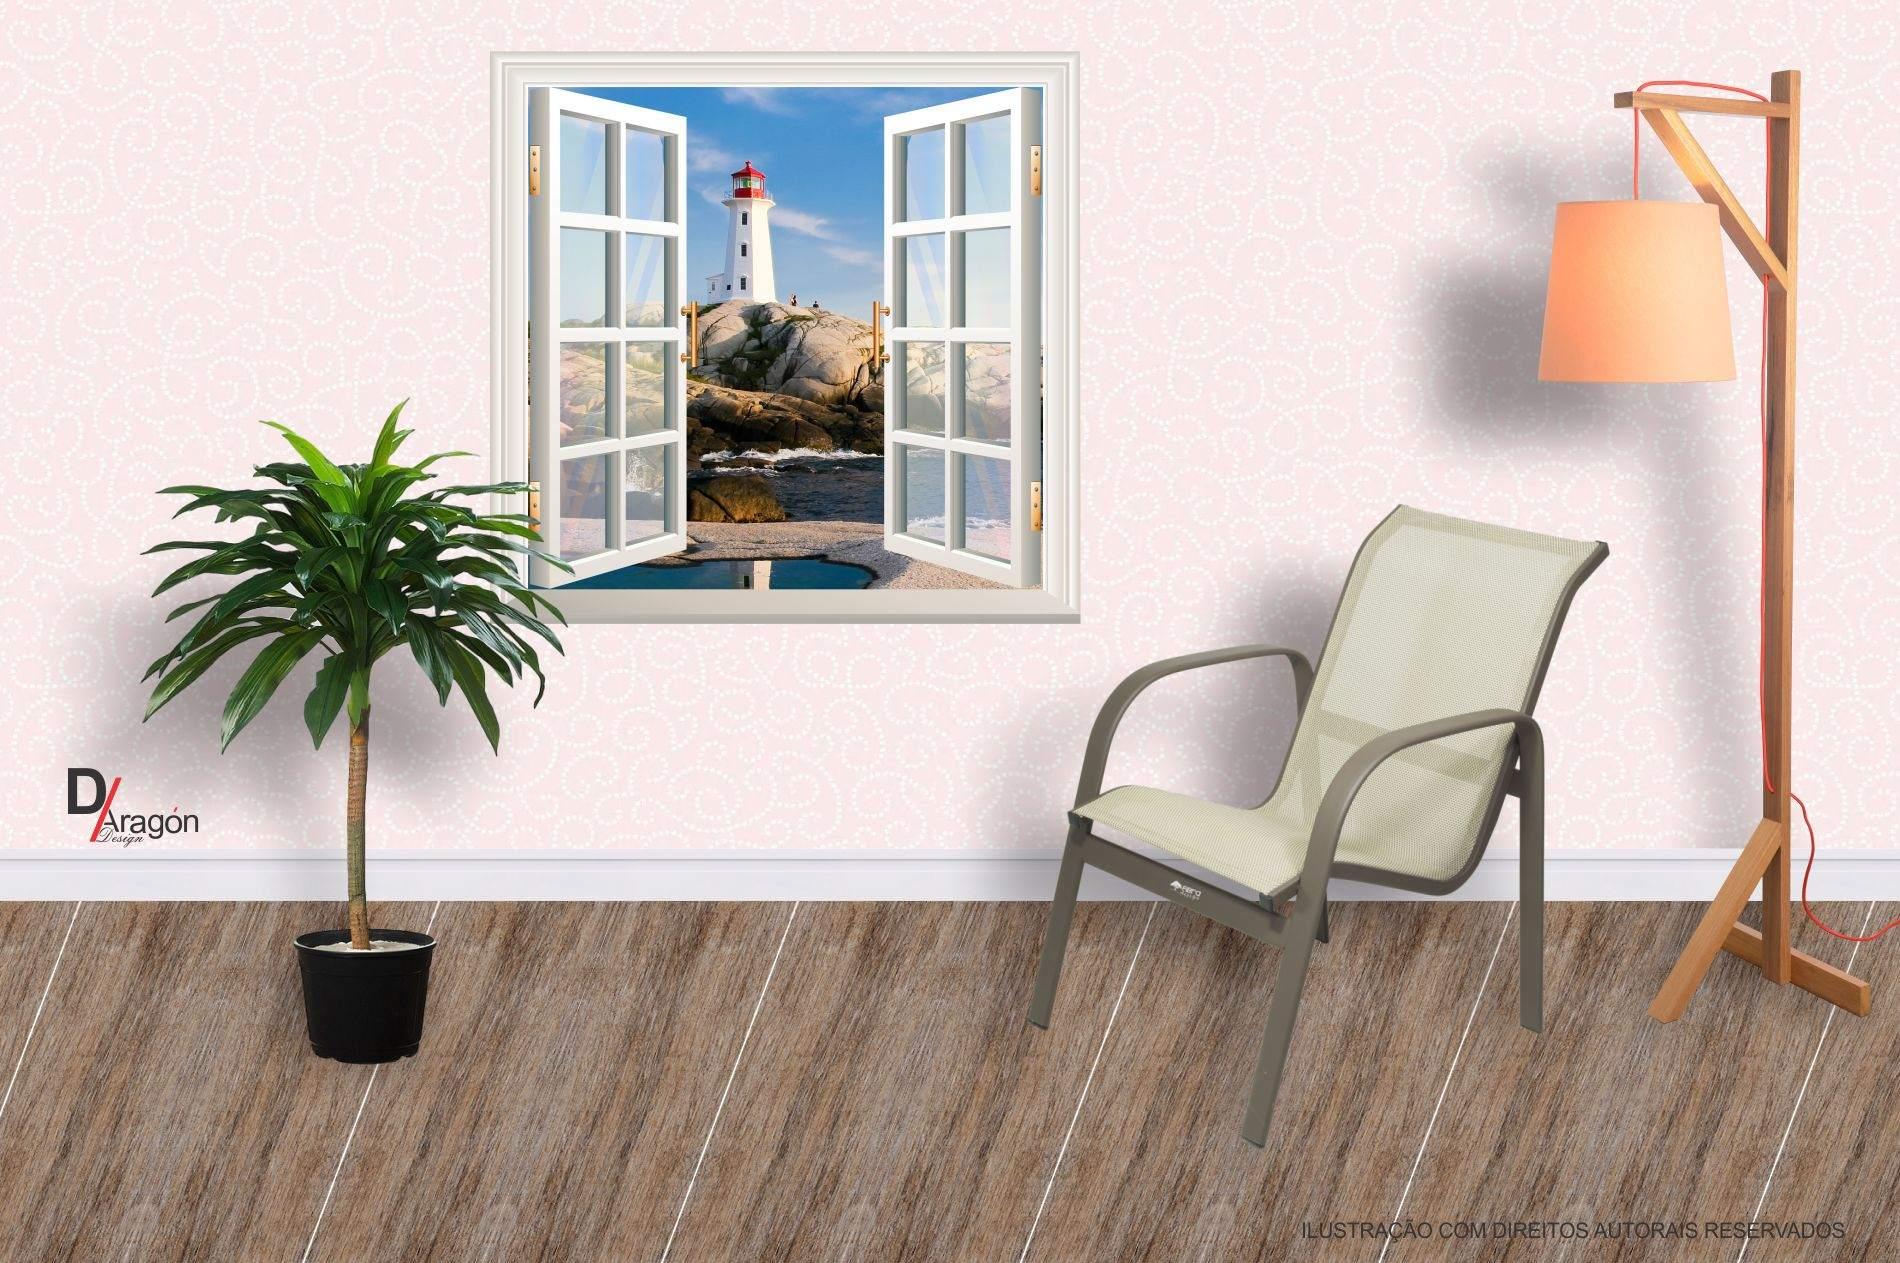 Adesivo de Parede Decorativo Janela 3D Vista do Farol